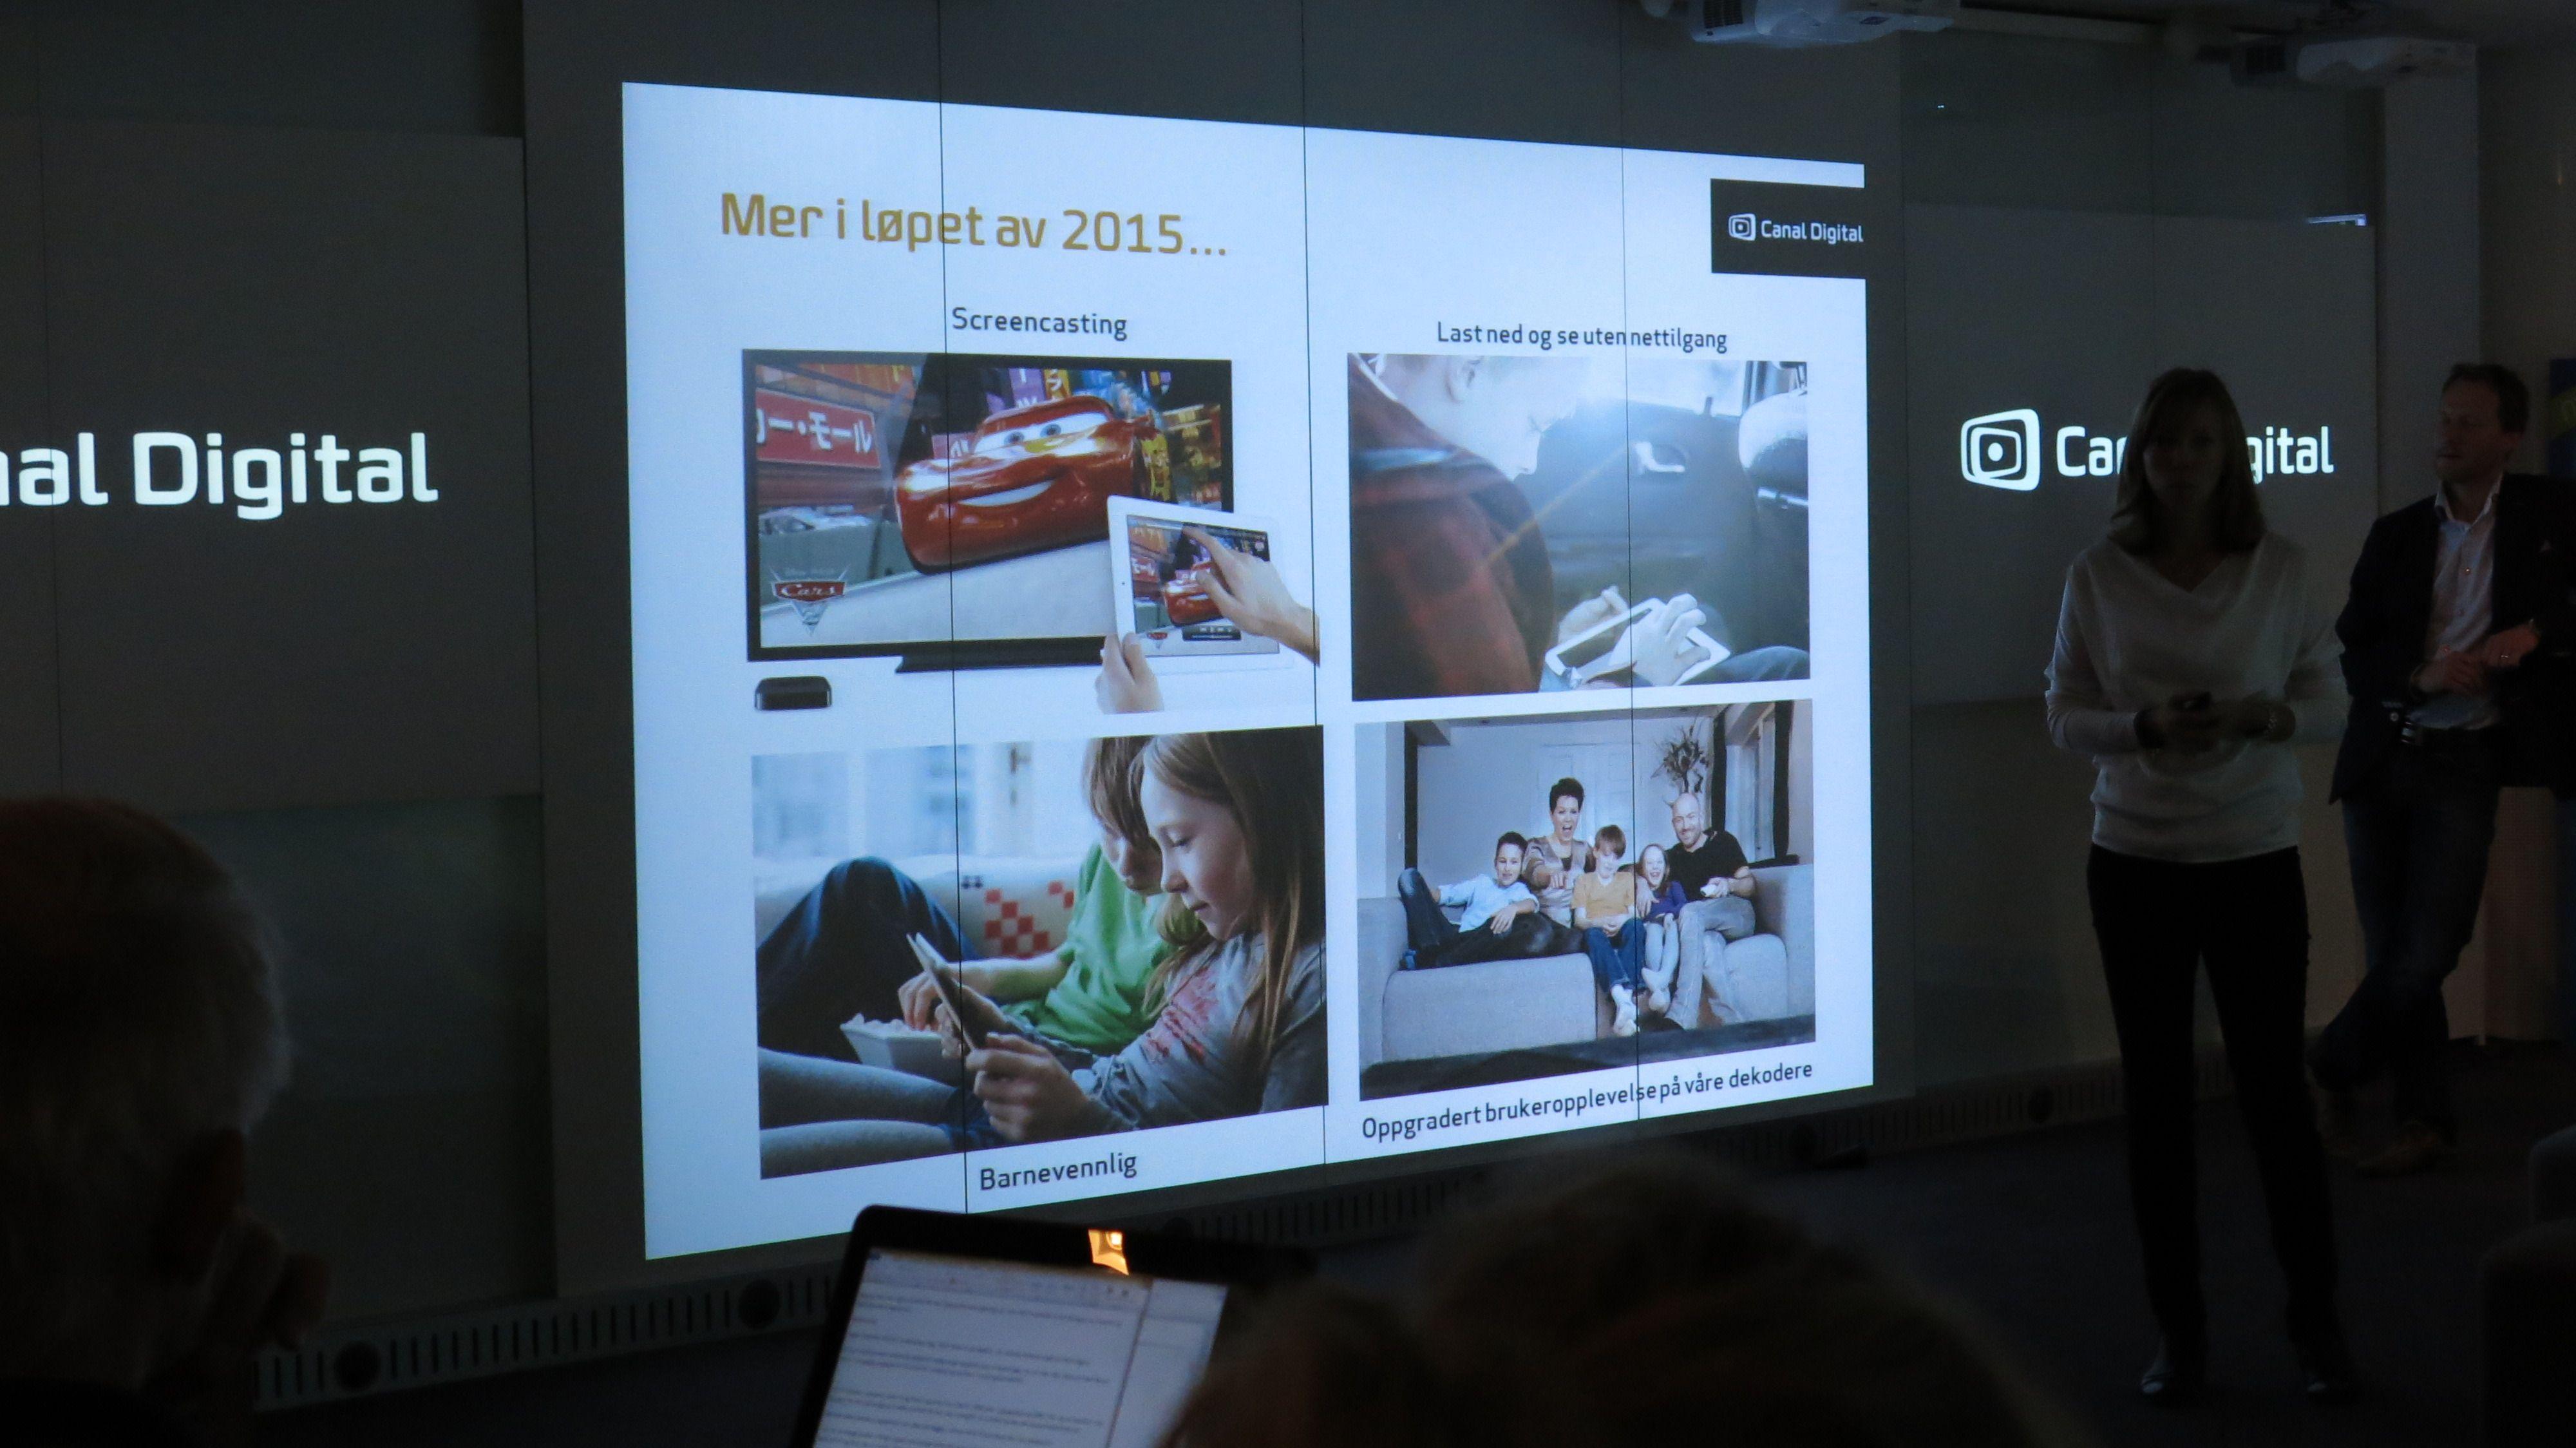 Flere endringer skal komme i 2015.Foto: Ole Henrik Johansen / Tek.no